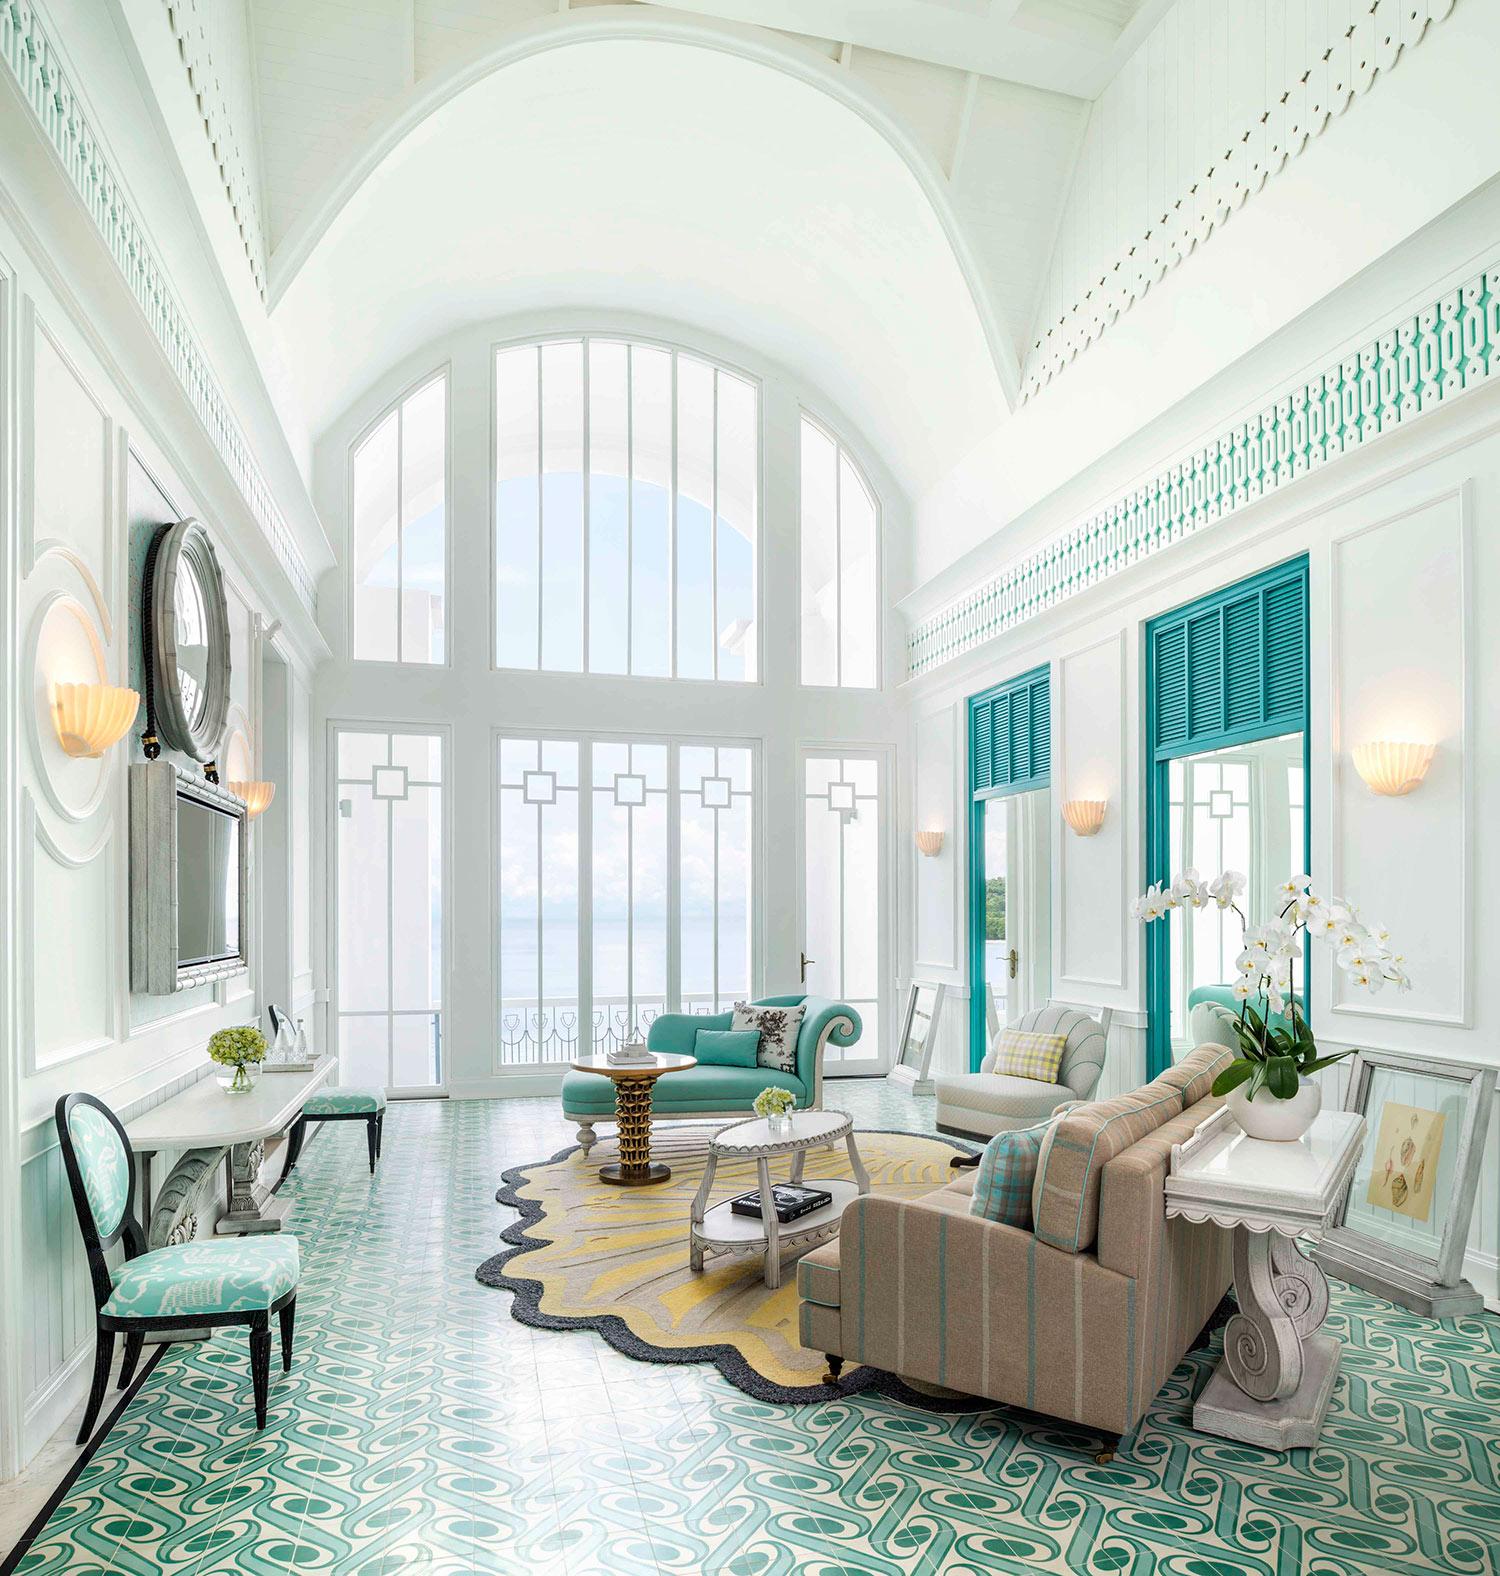 02_Turquoise-Suite-Room_Department-of-Seashell.jpg